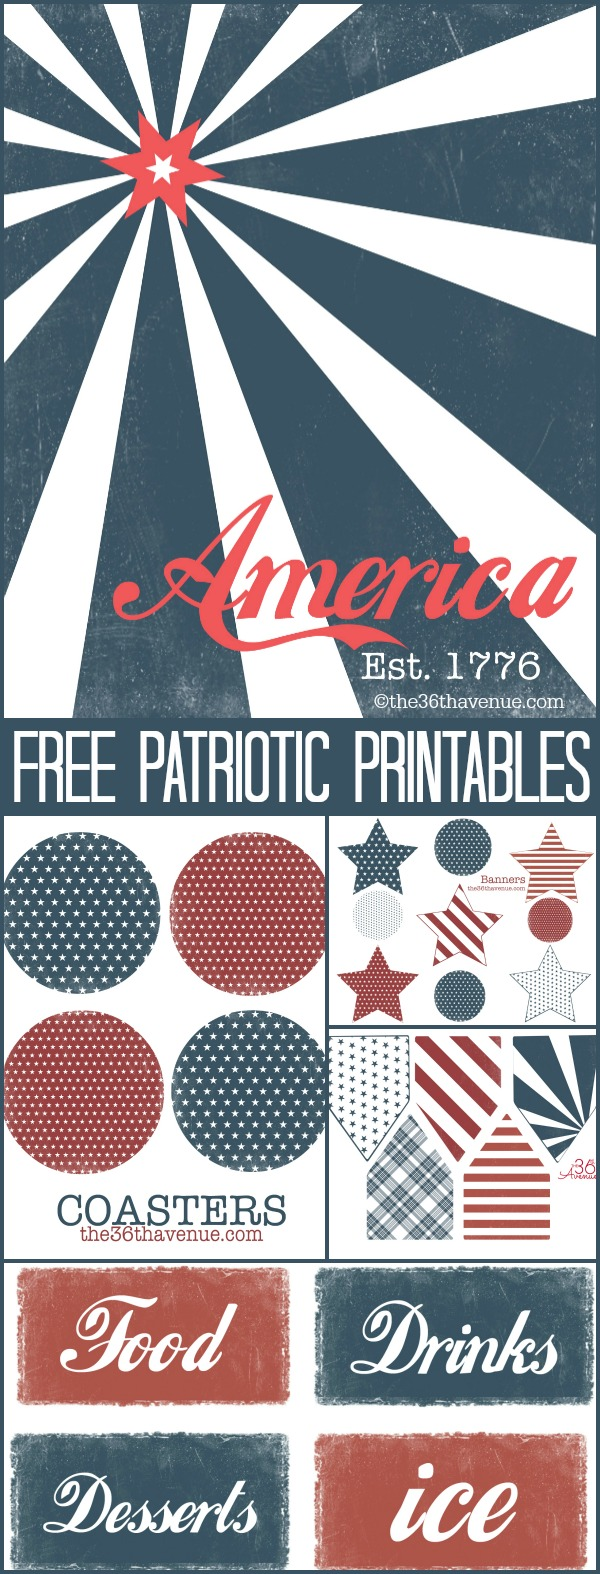 4th of July Printable Kit